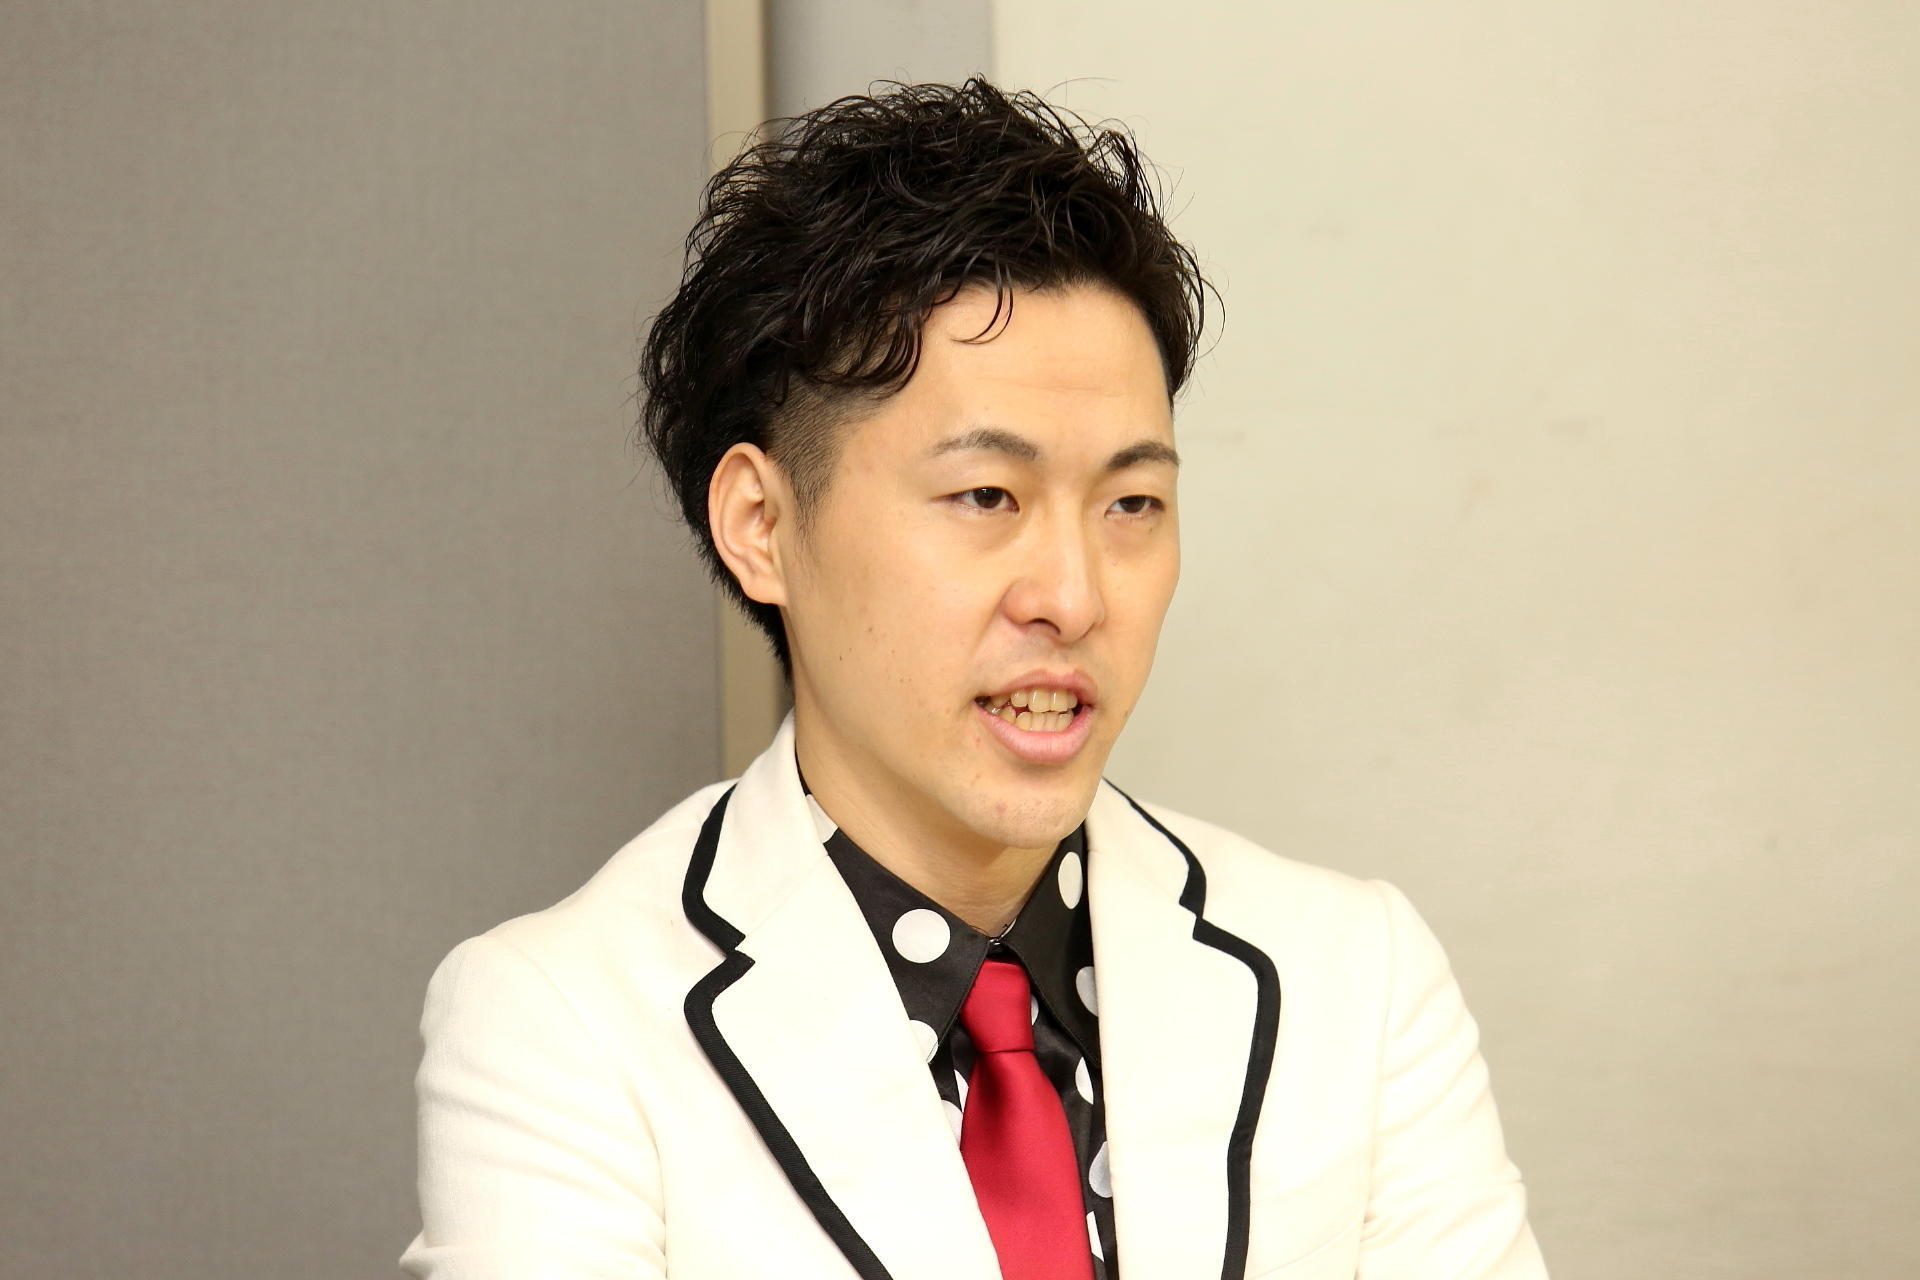 http://news.yoshimoto.co.jp/20170226202534-23107009d478bd8cd53eef180d7d5097df1cc83c.jpg